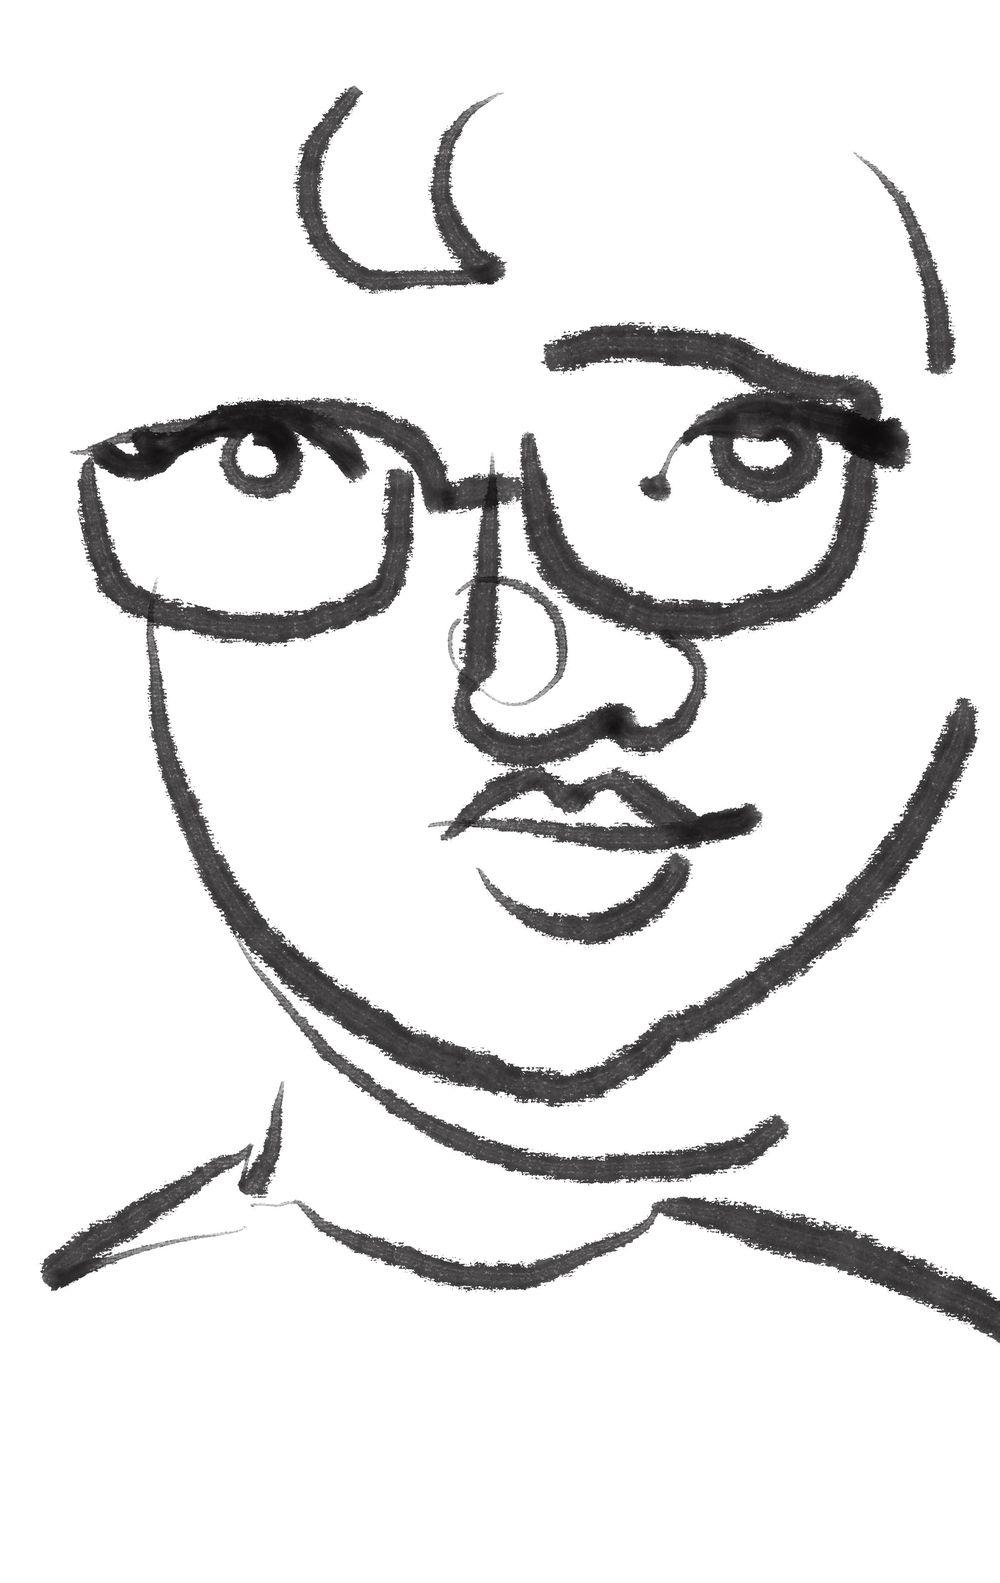 Self Portraits - image 3 - student project